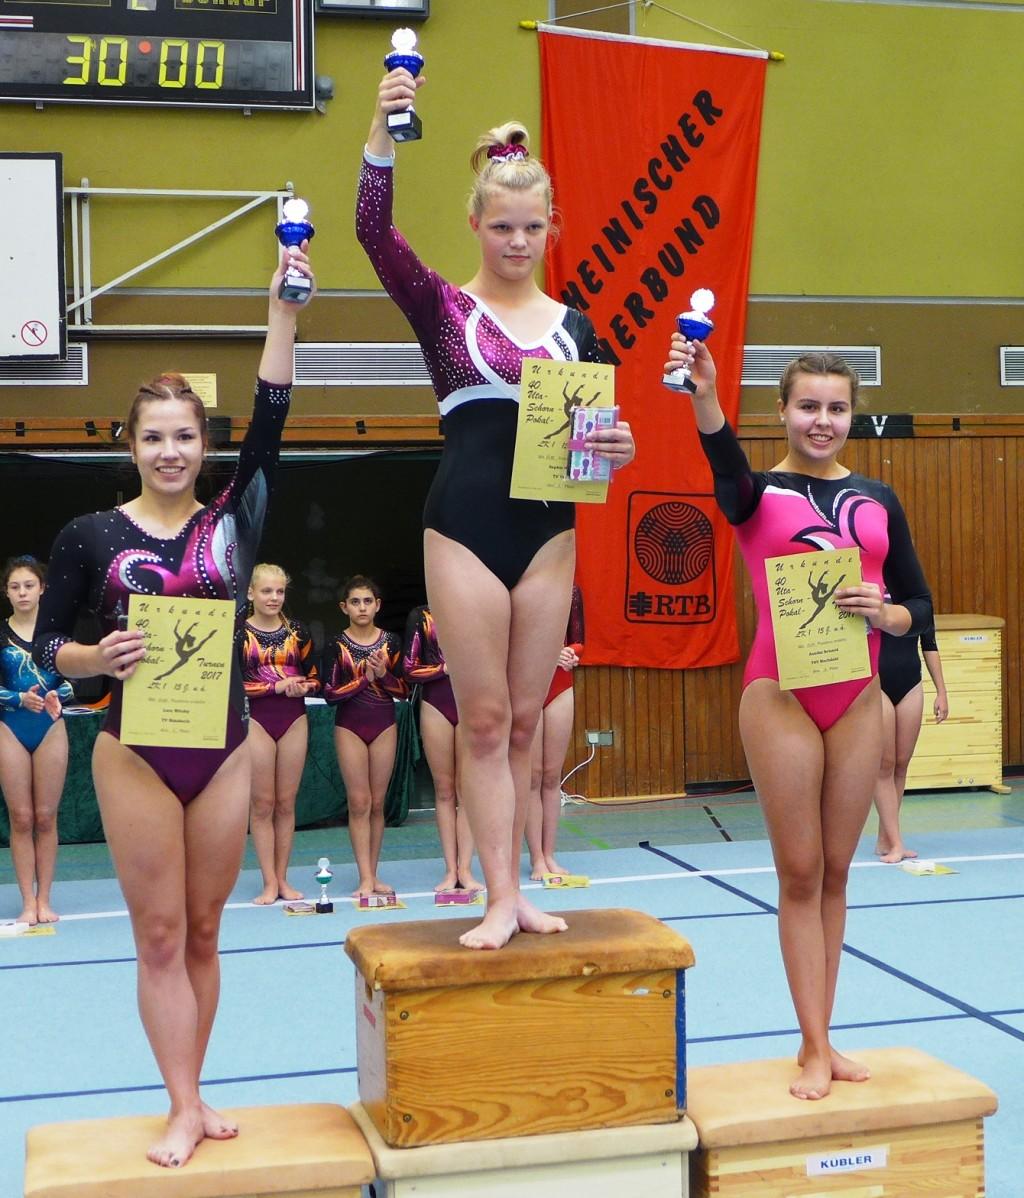 Siegerinnen LK2 - 15 J. u.ä. - 40. Uta-Schorn-Pokal